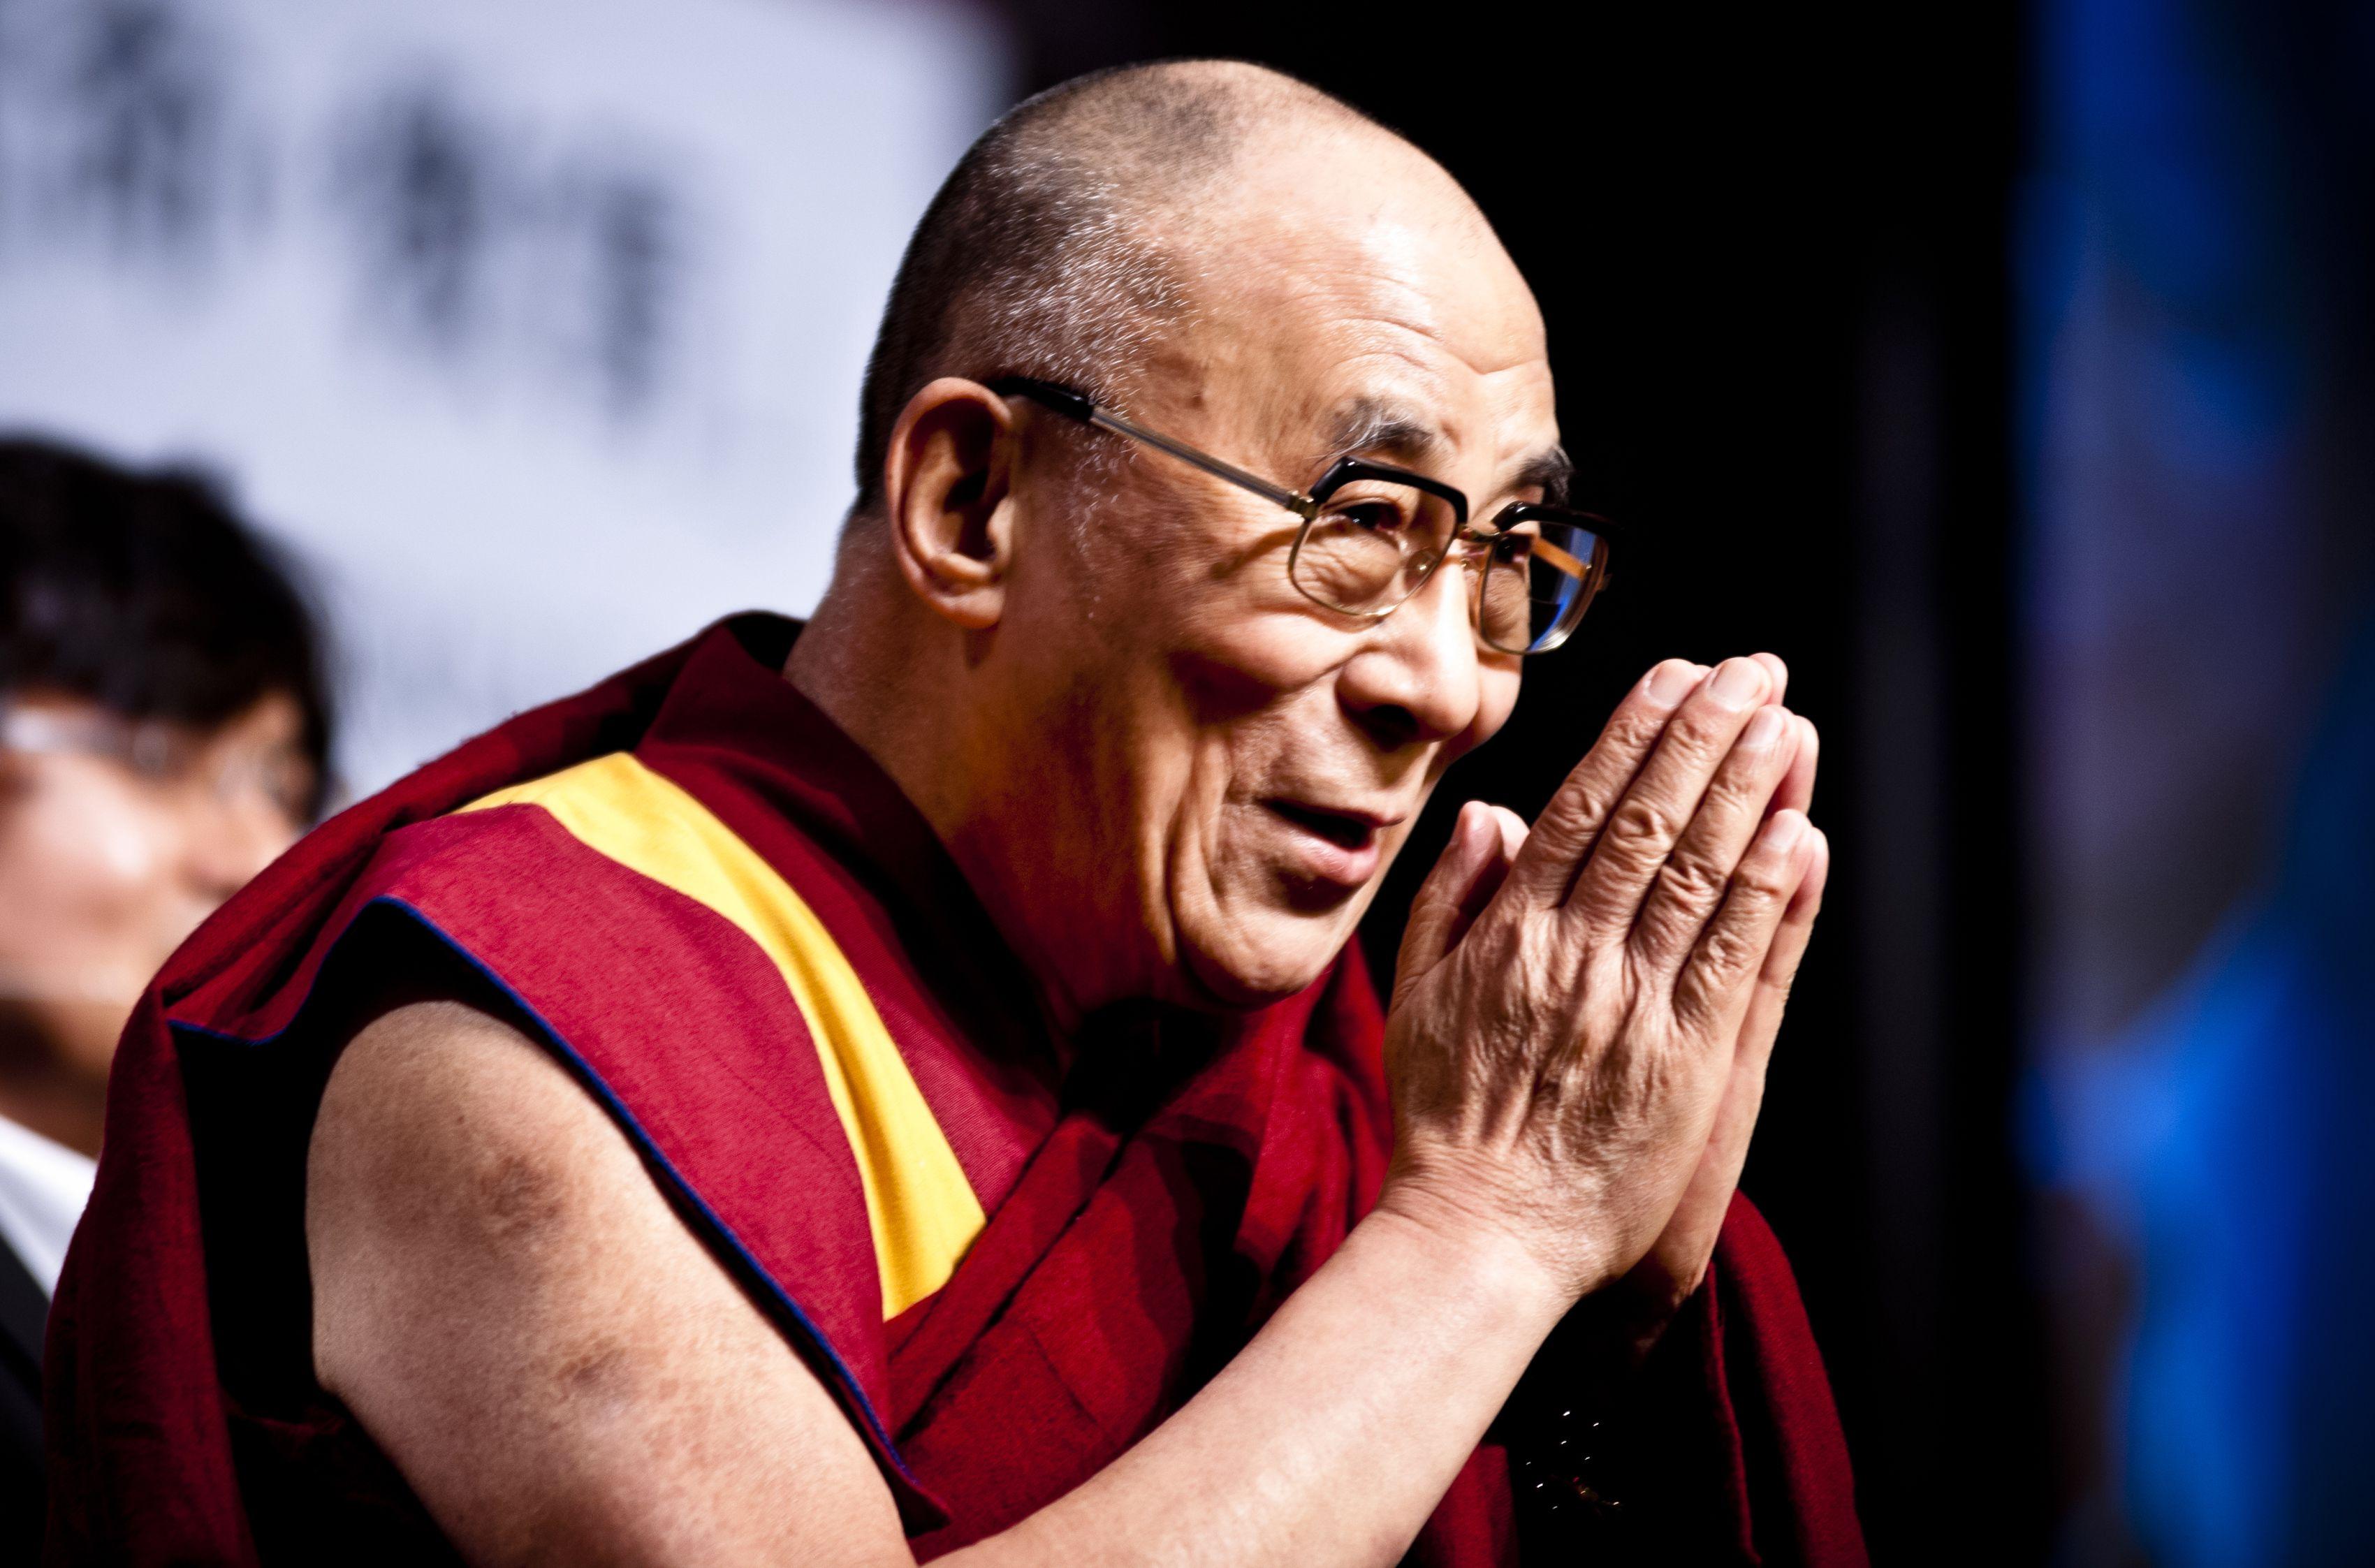 Did The Dalai Lama Endorse Gay Marriage